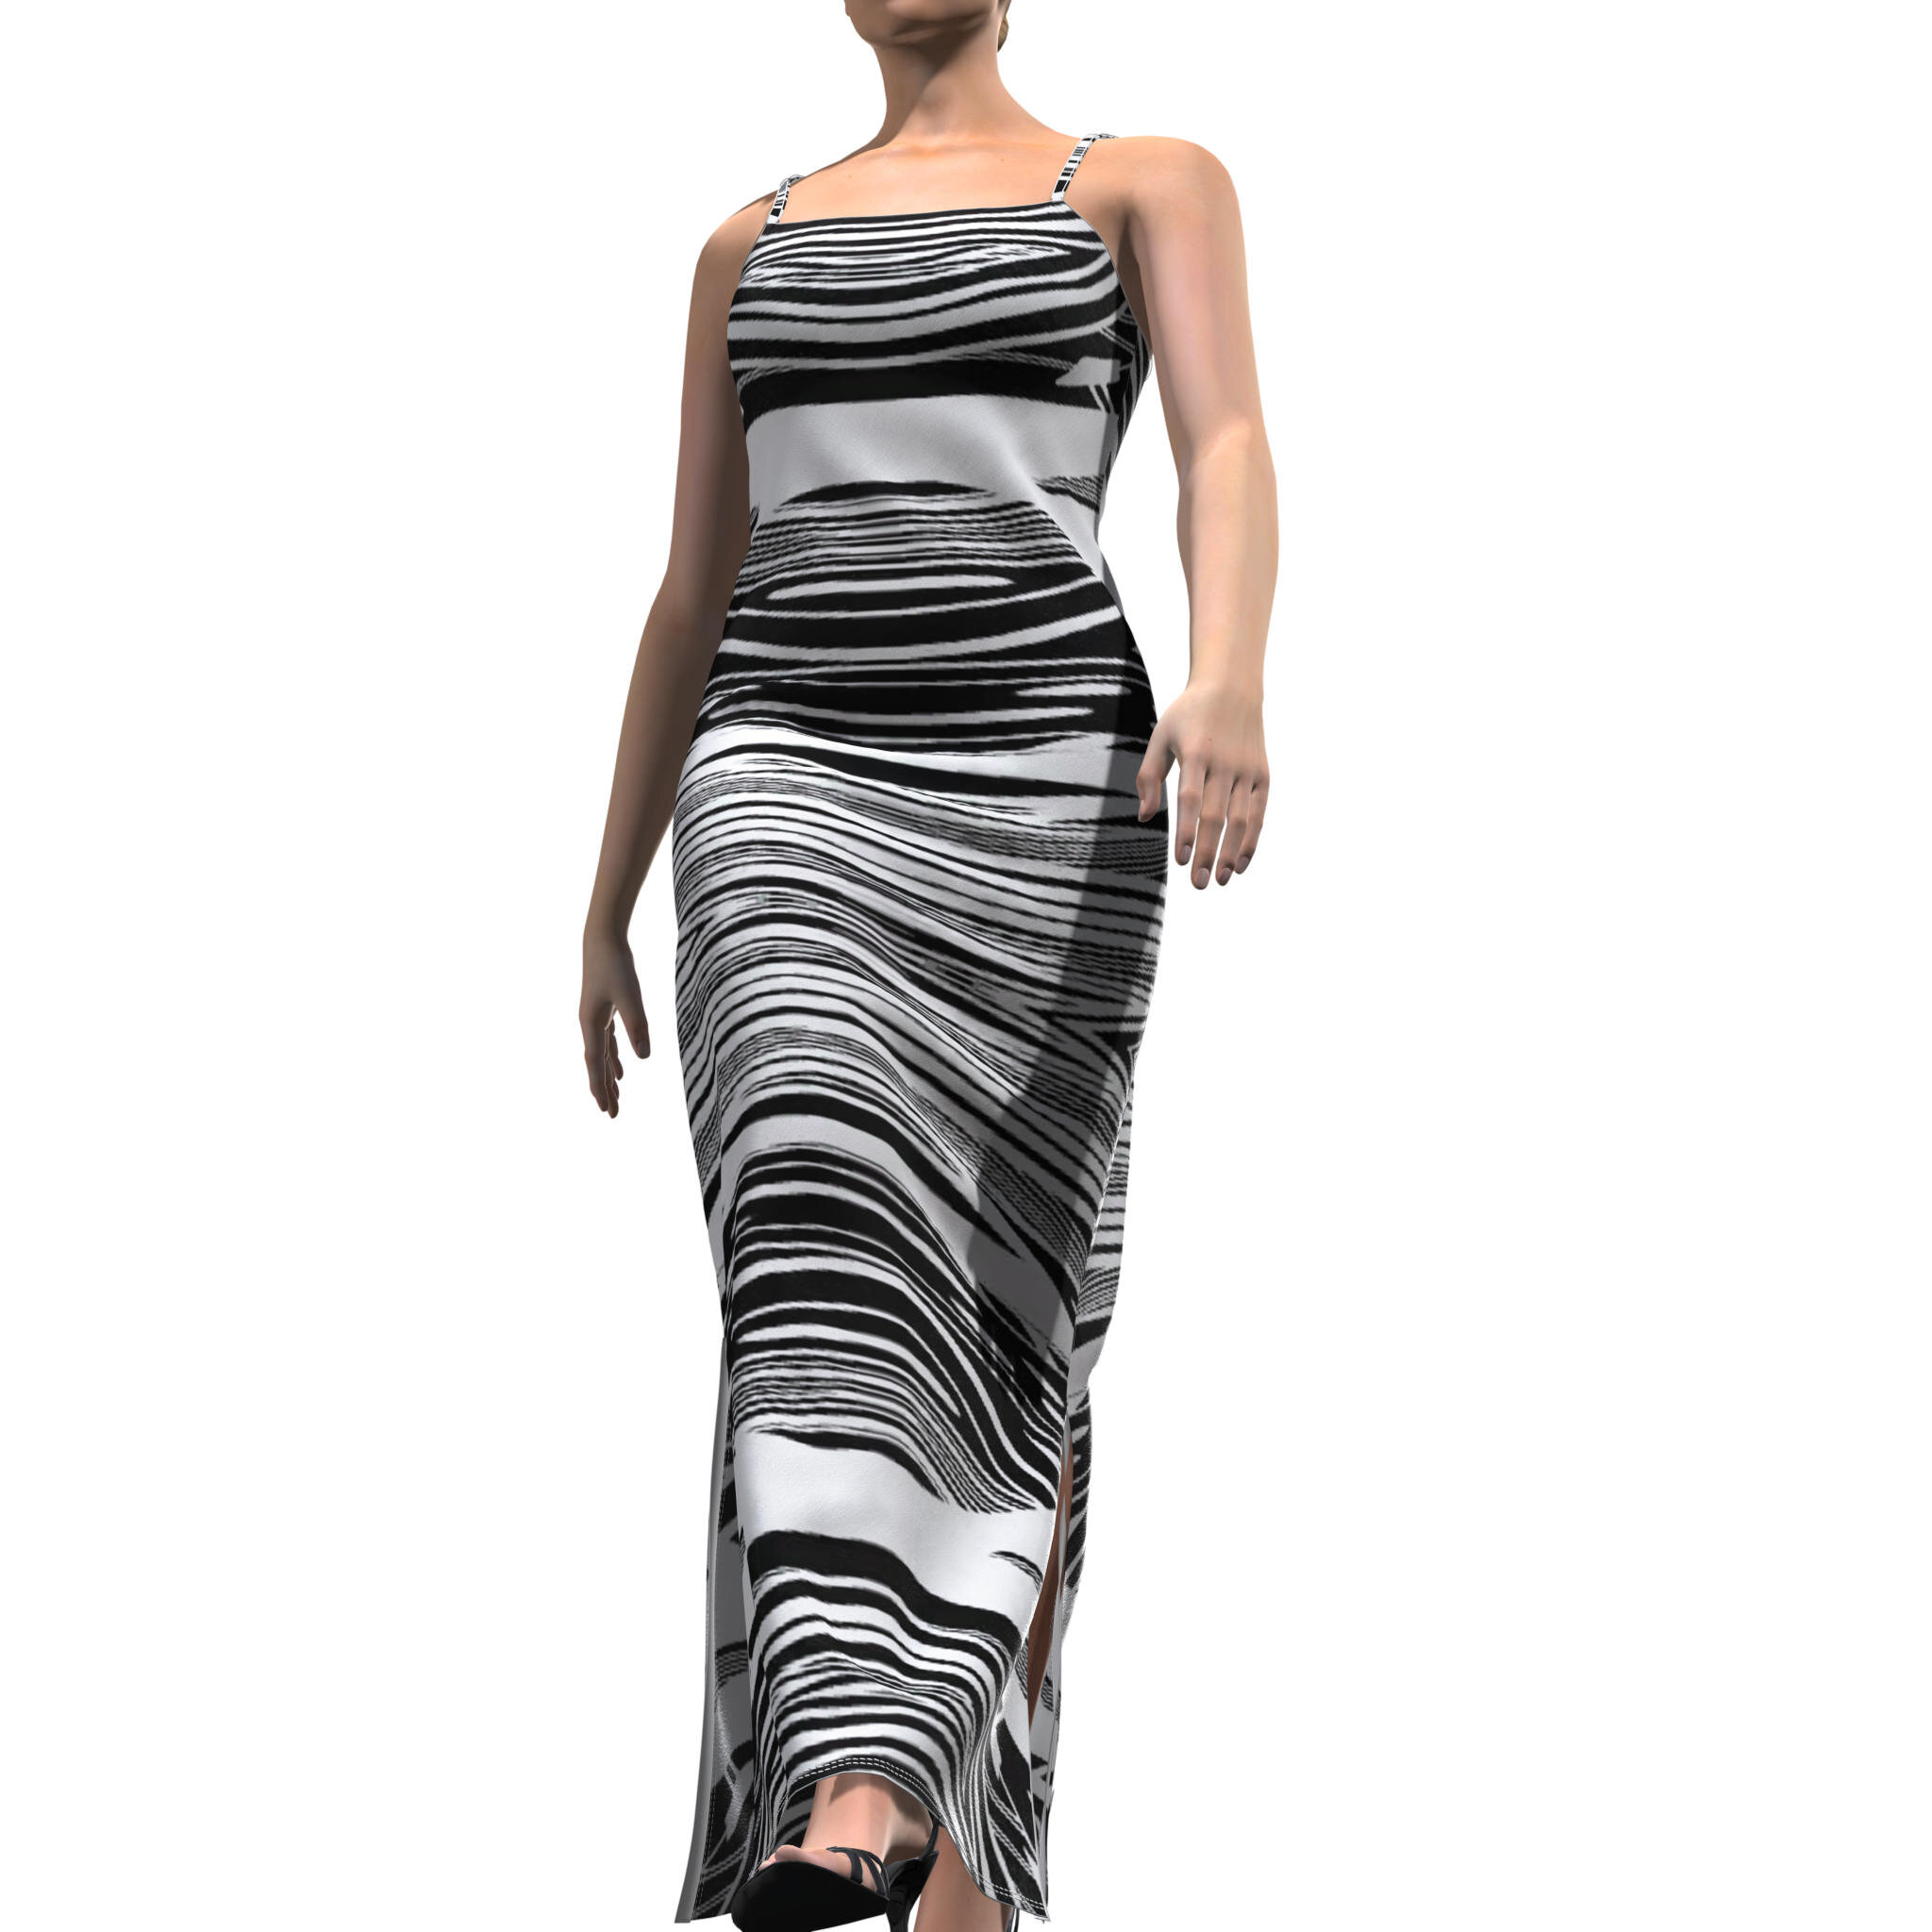 3d Digital Patterns And Virtual Sampling For Fashion